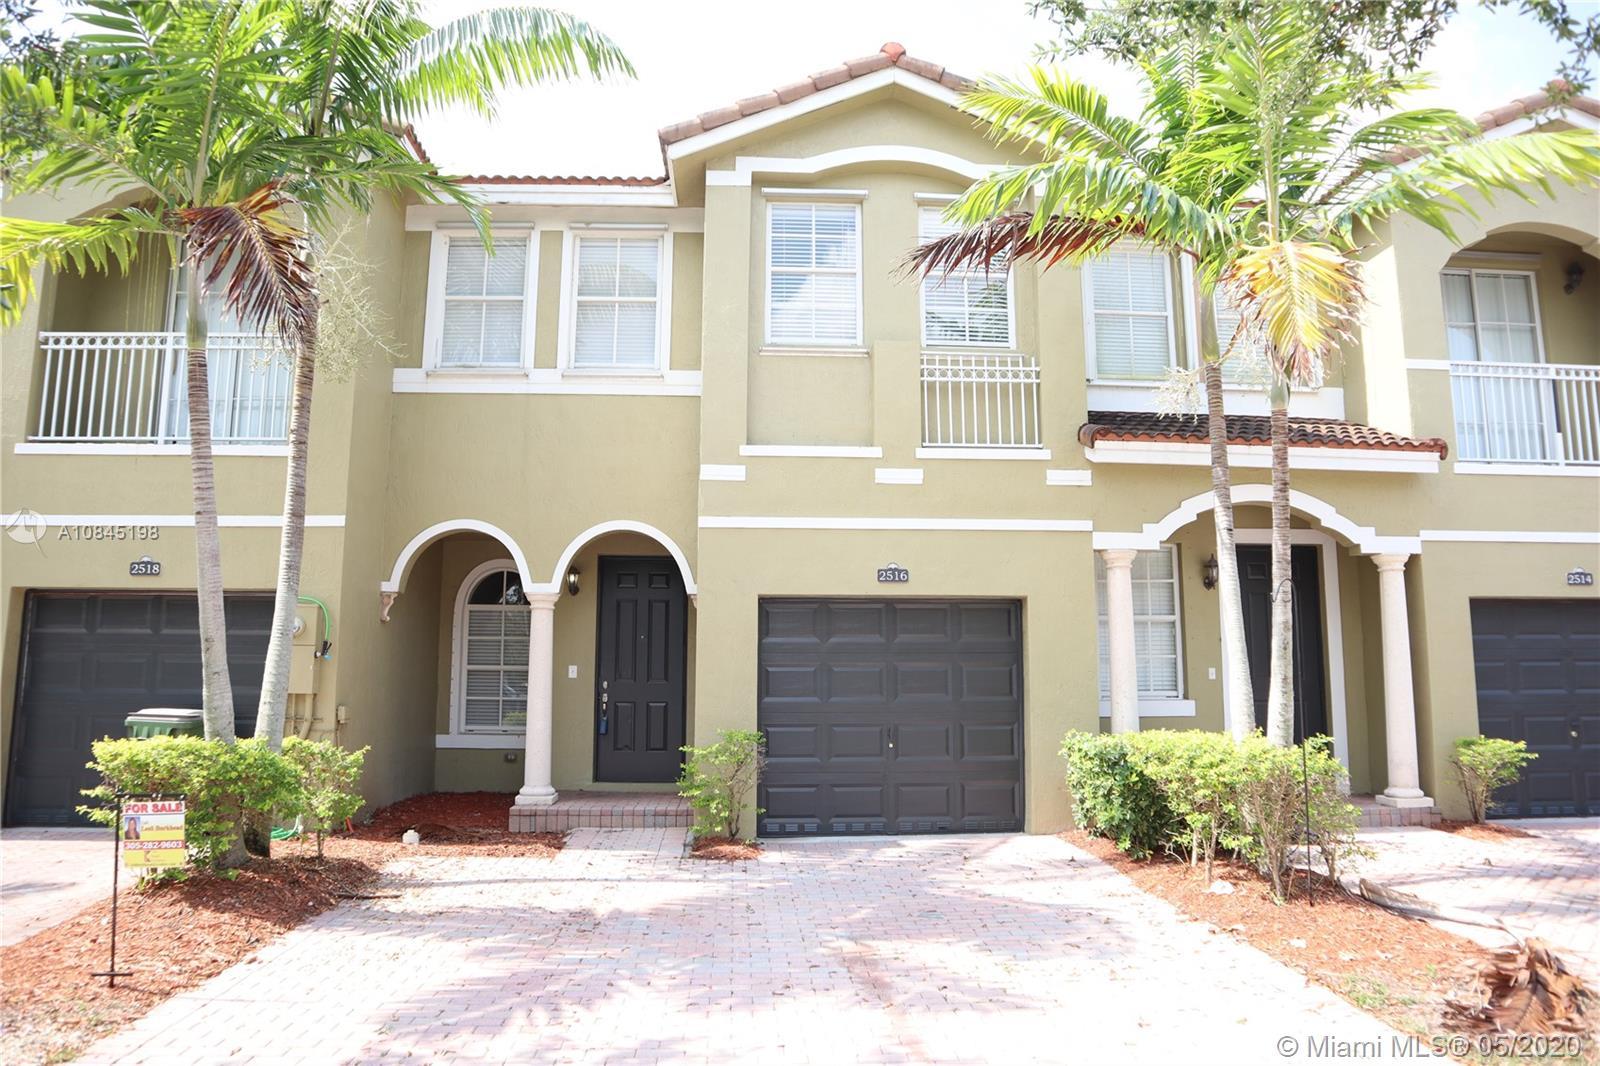 2516 SE 15 Ct, Homestead, FL 33035 - Homestead, FL real estate listing